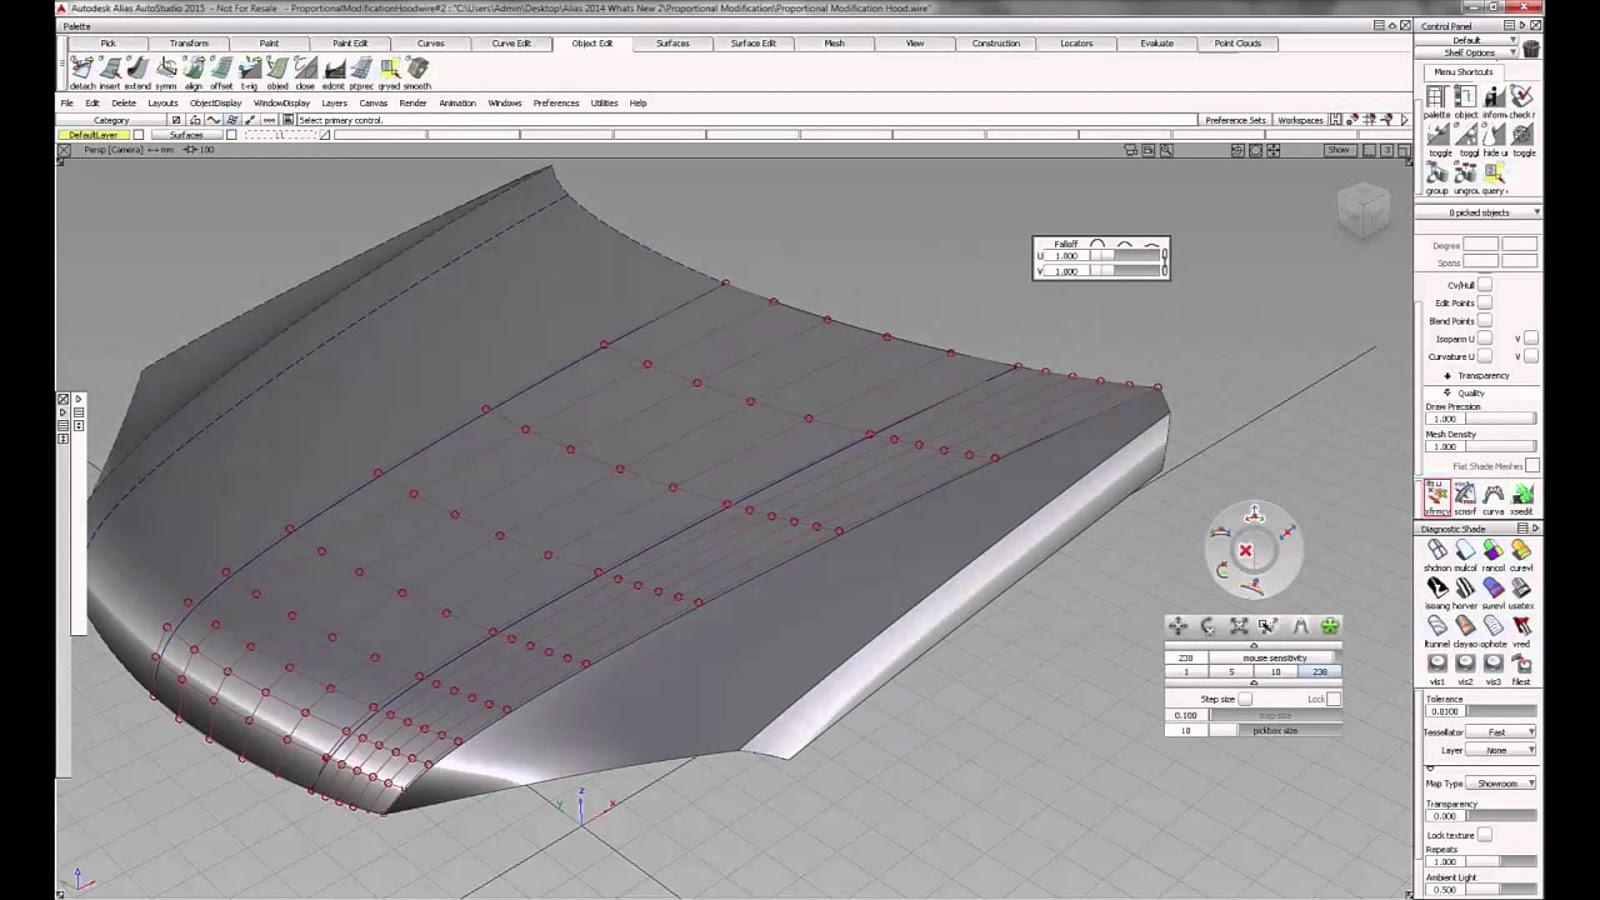 Autodesk Alias AutoStudio 2015 Free Download Offline